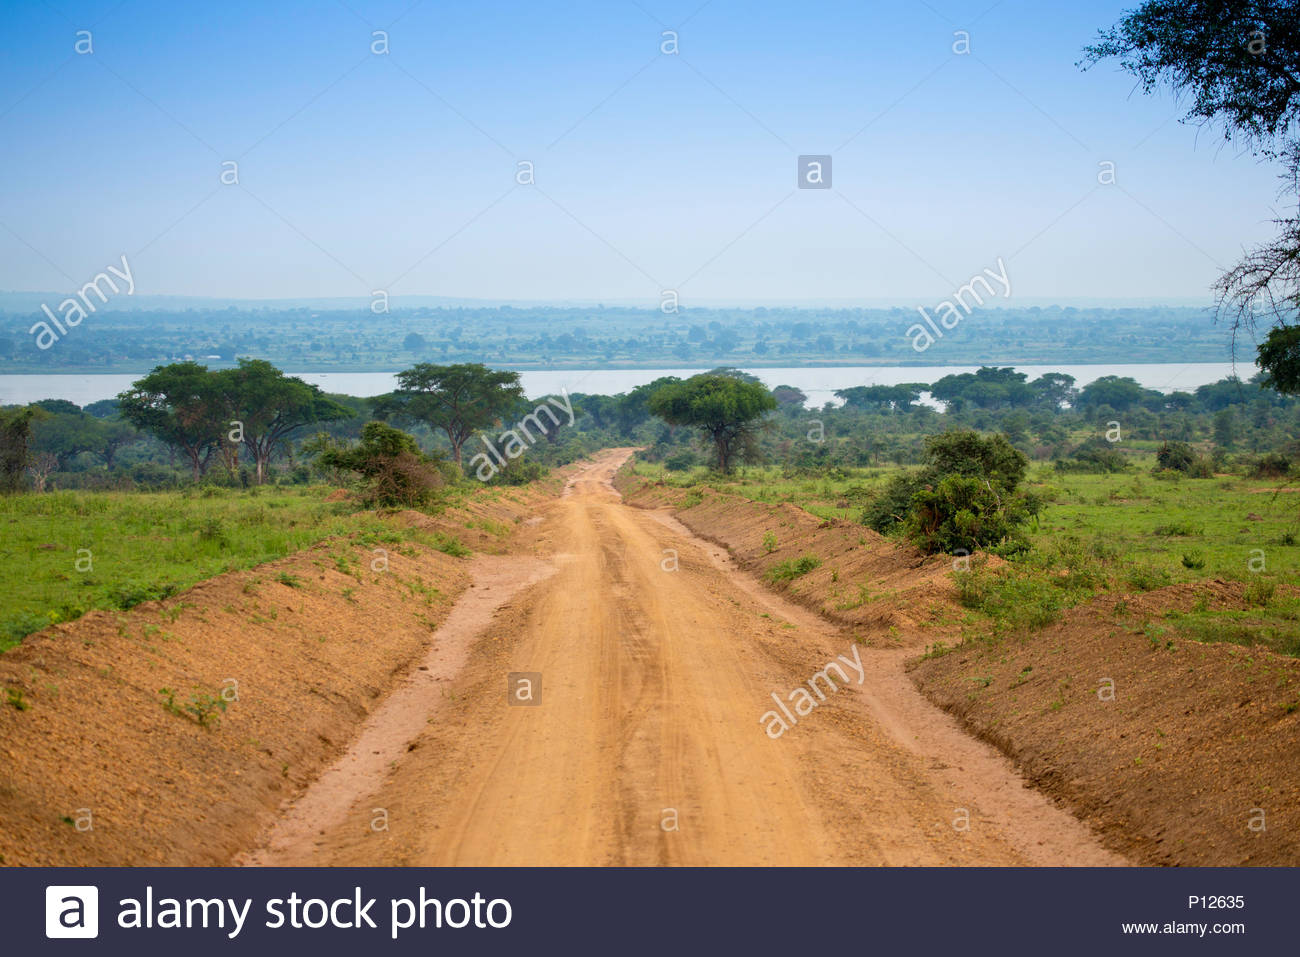 Murchison Falls National Park, Safari landscapes, Uganda, Africa - Stock Image